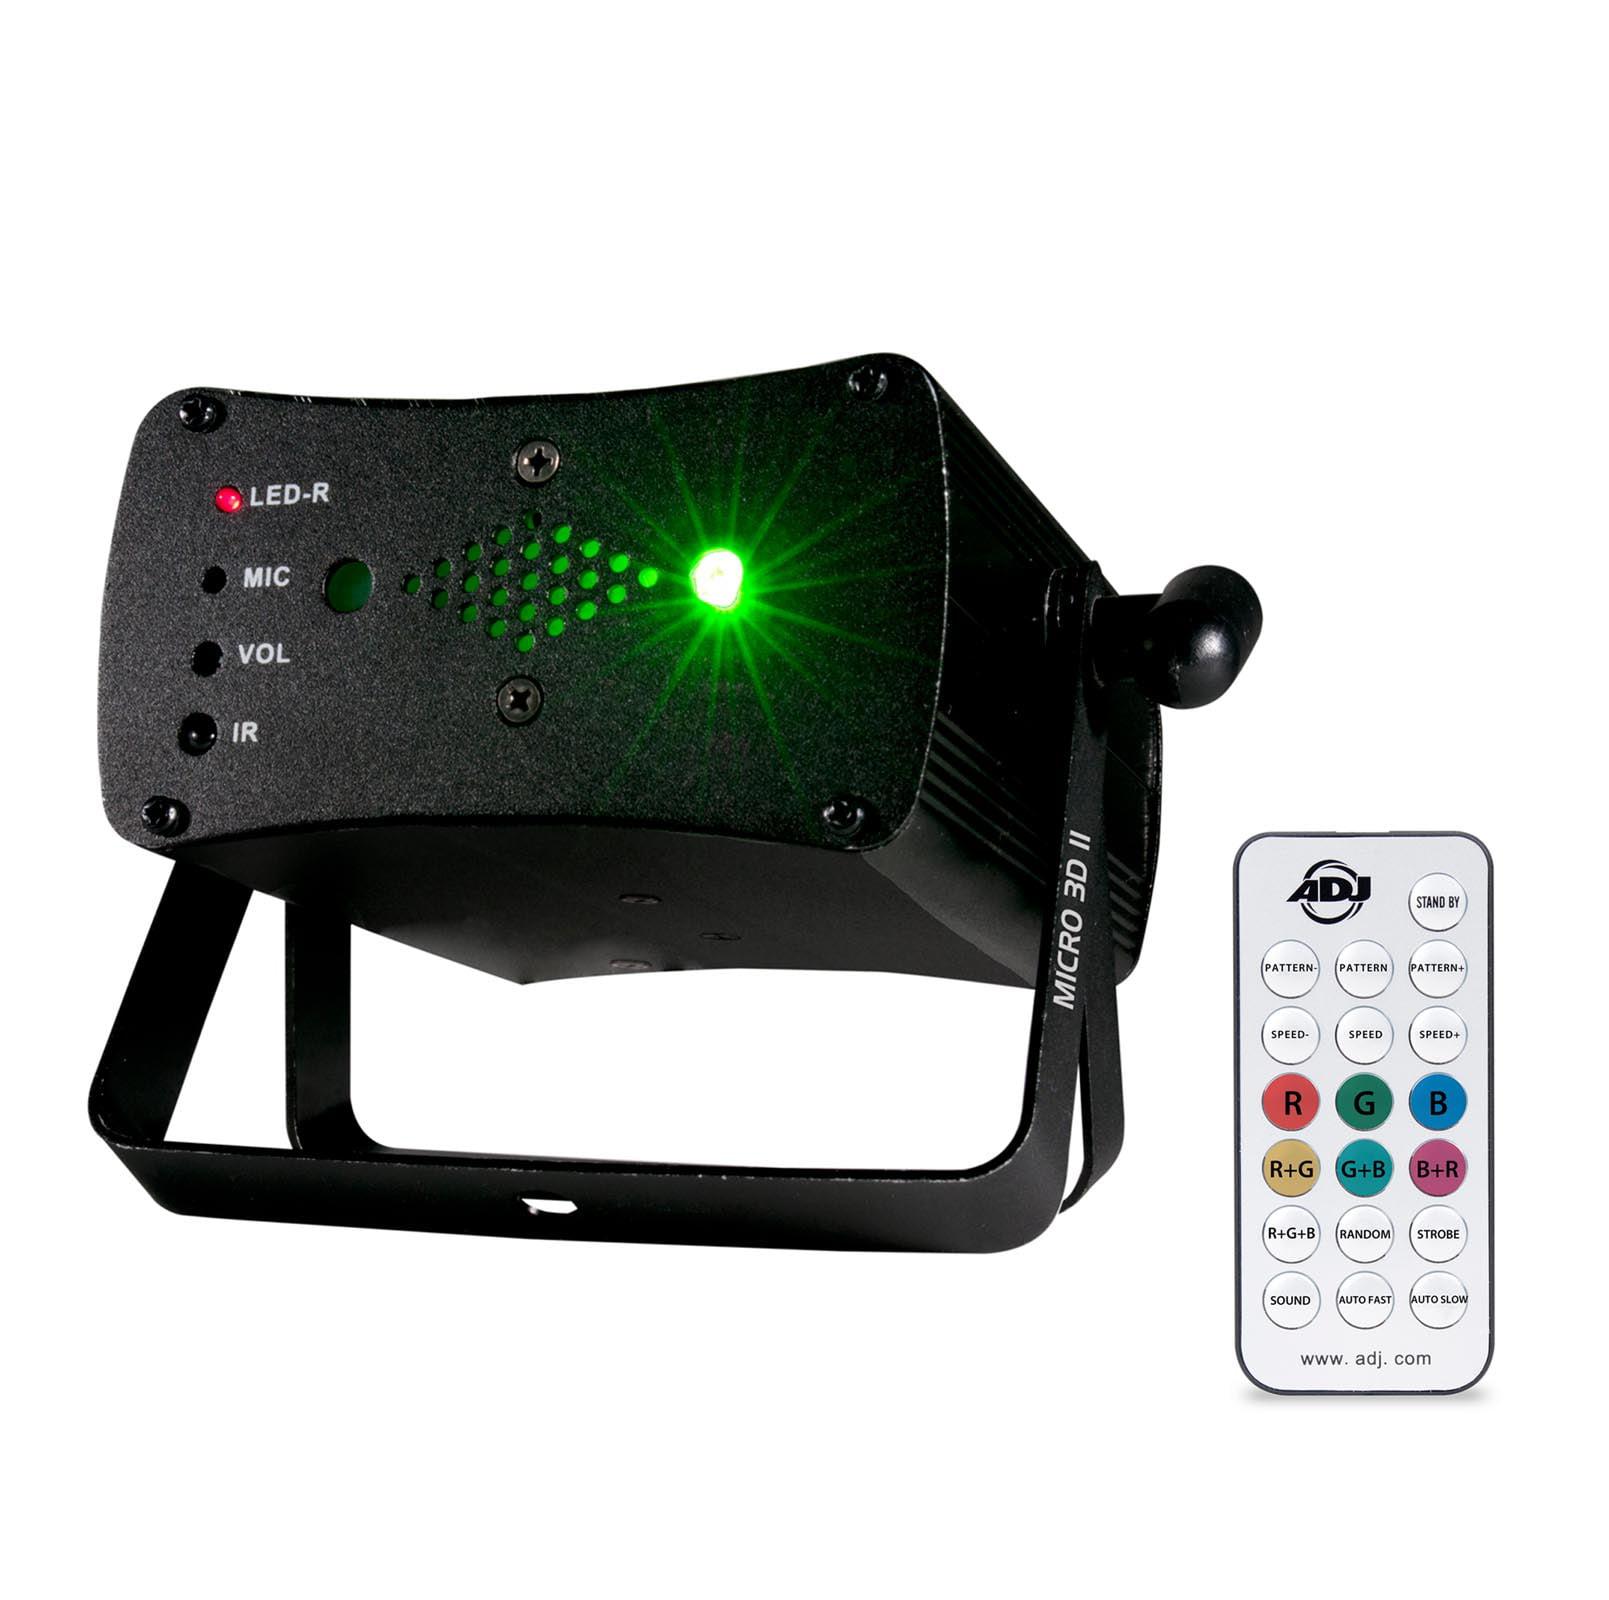 American DJ Micro 3D II Green & Red Laser Lighting Effect w  Wireless IR Remote by ADJ